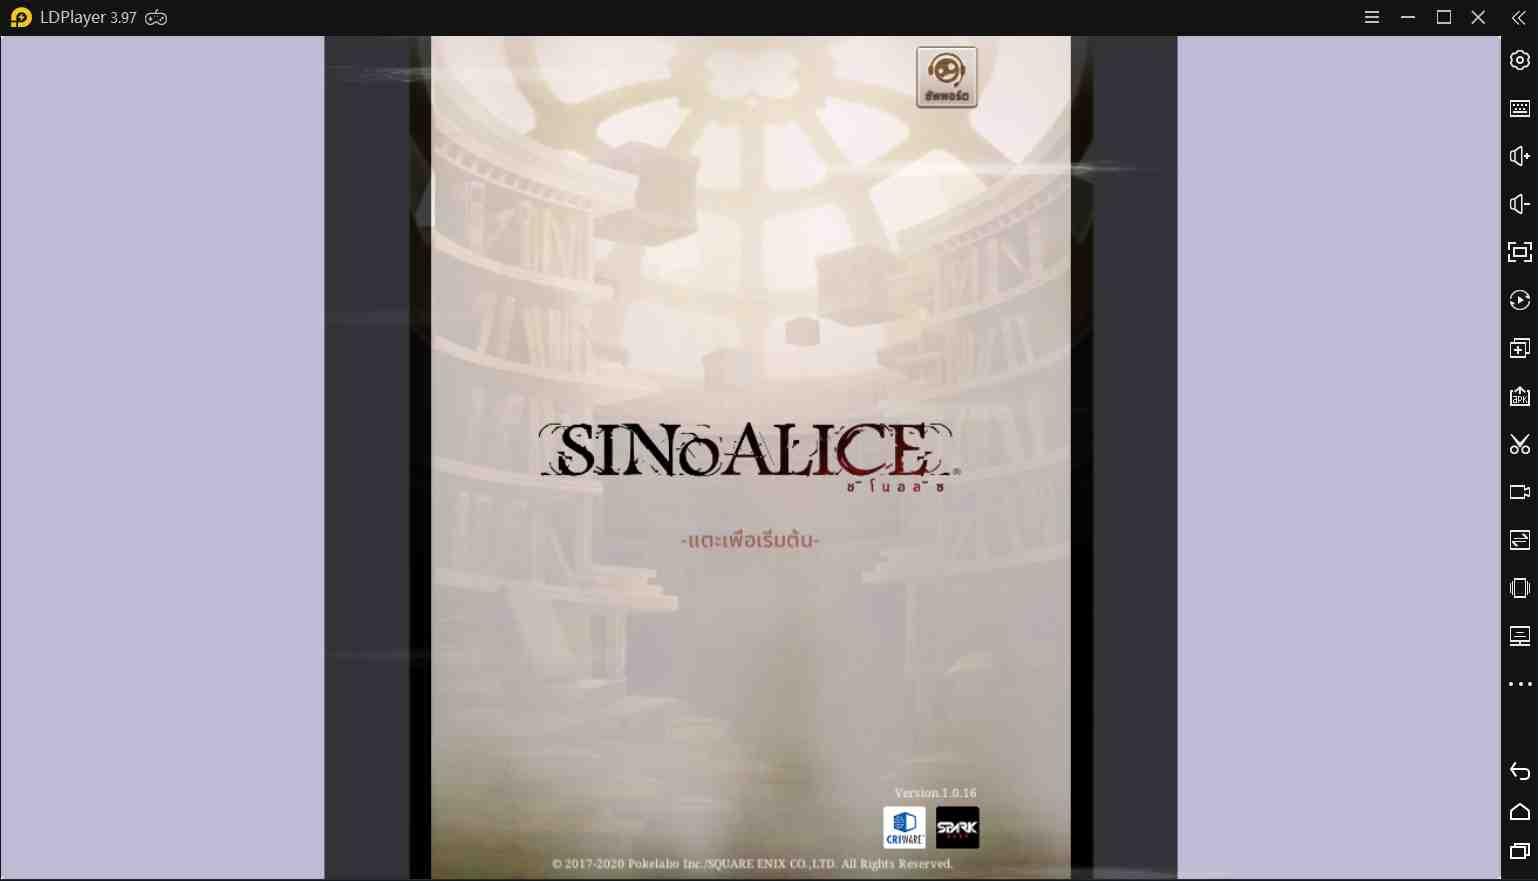 SINoALICE (ชิโนอลิส)บนพีซี: วิธีดาวน์โหลดและเล่น